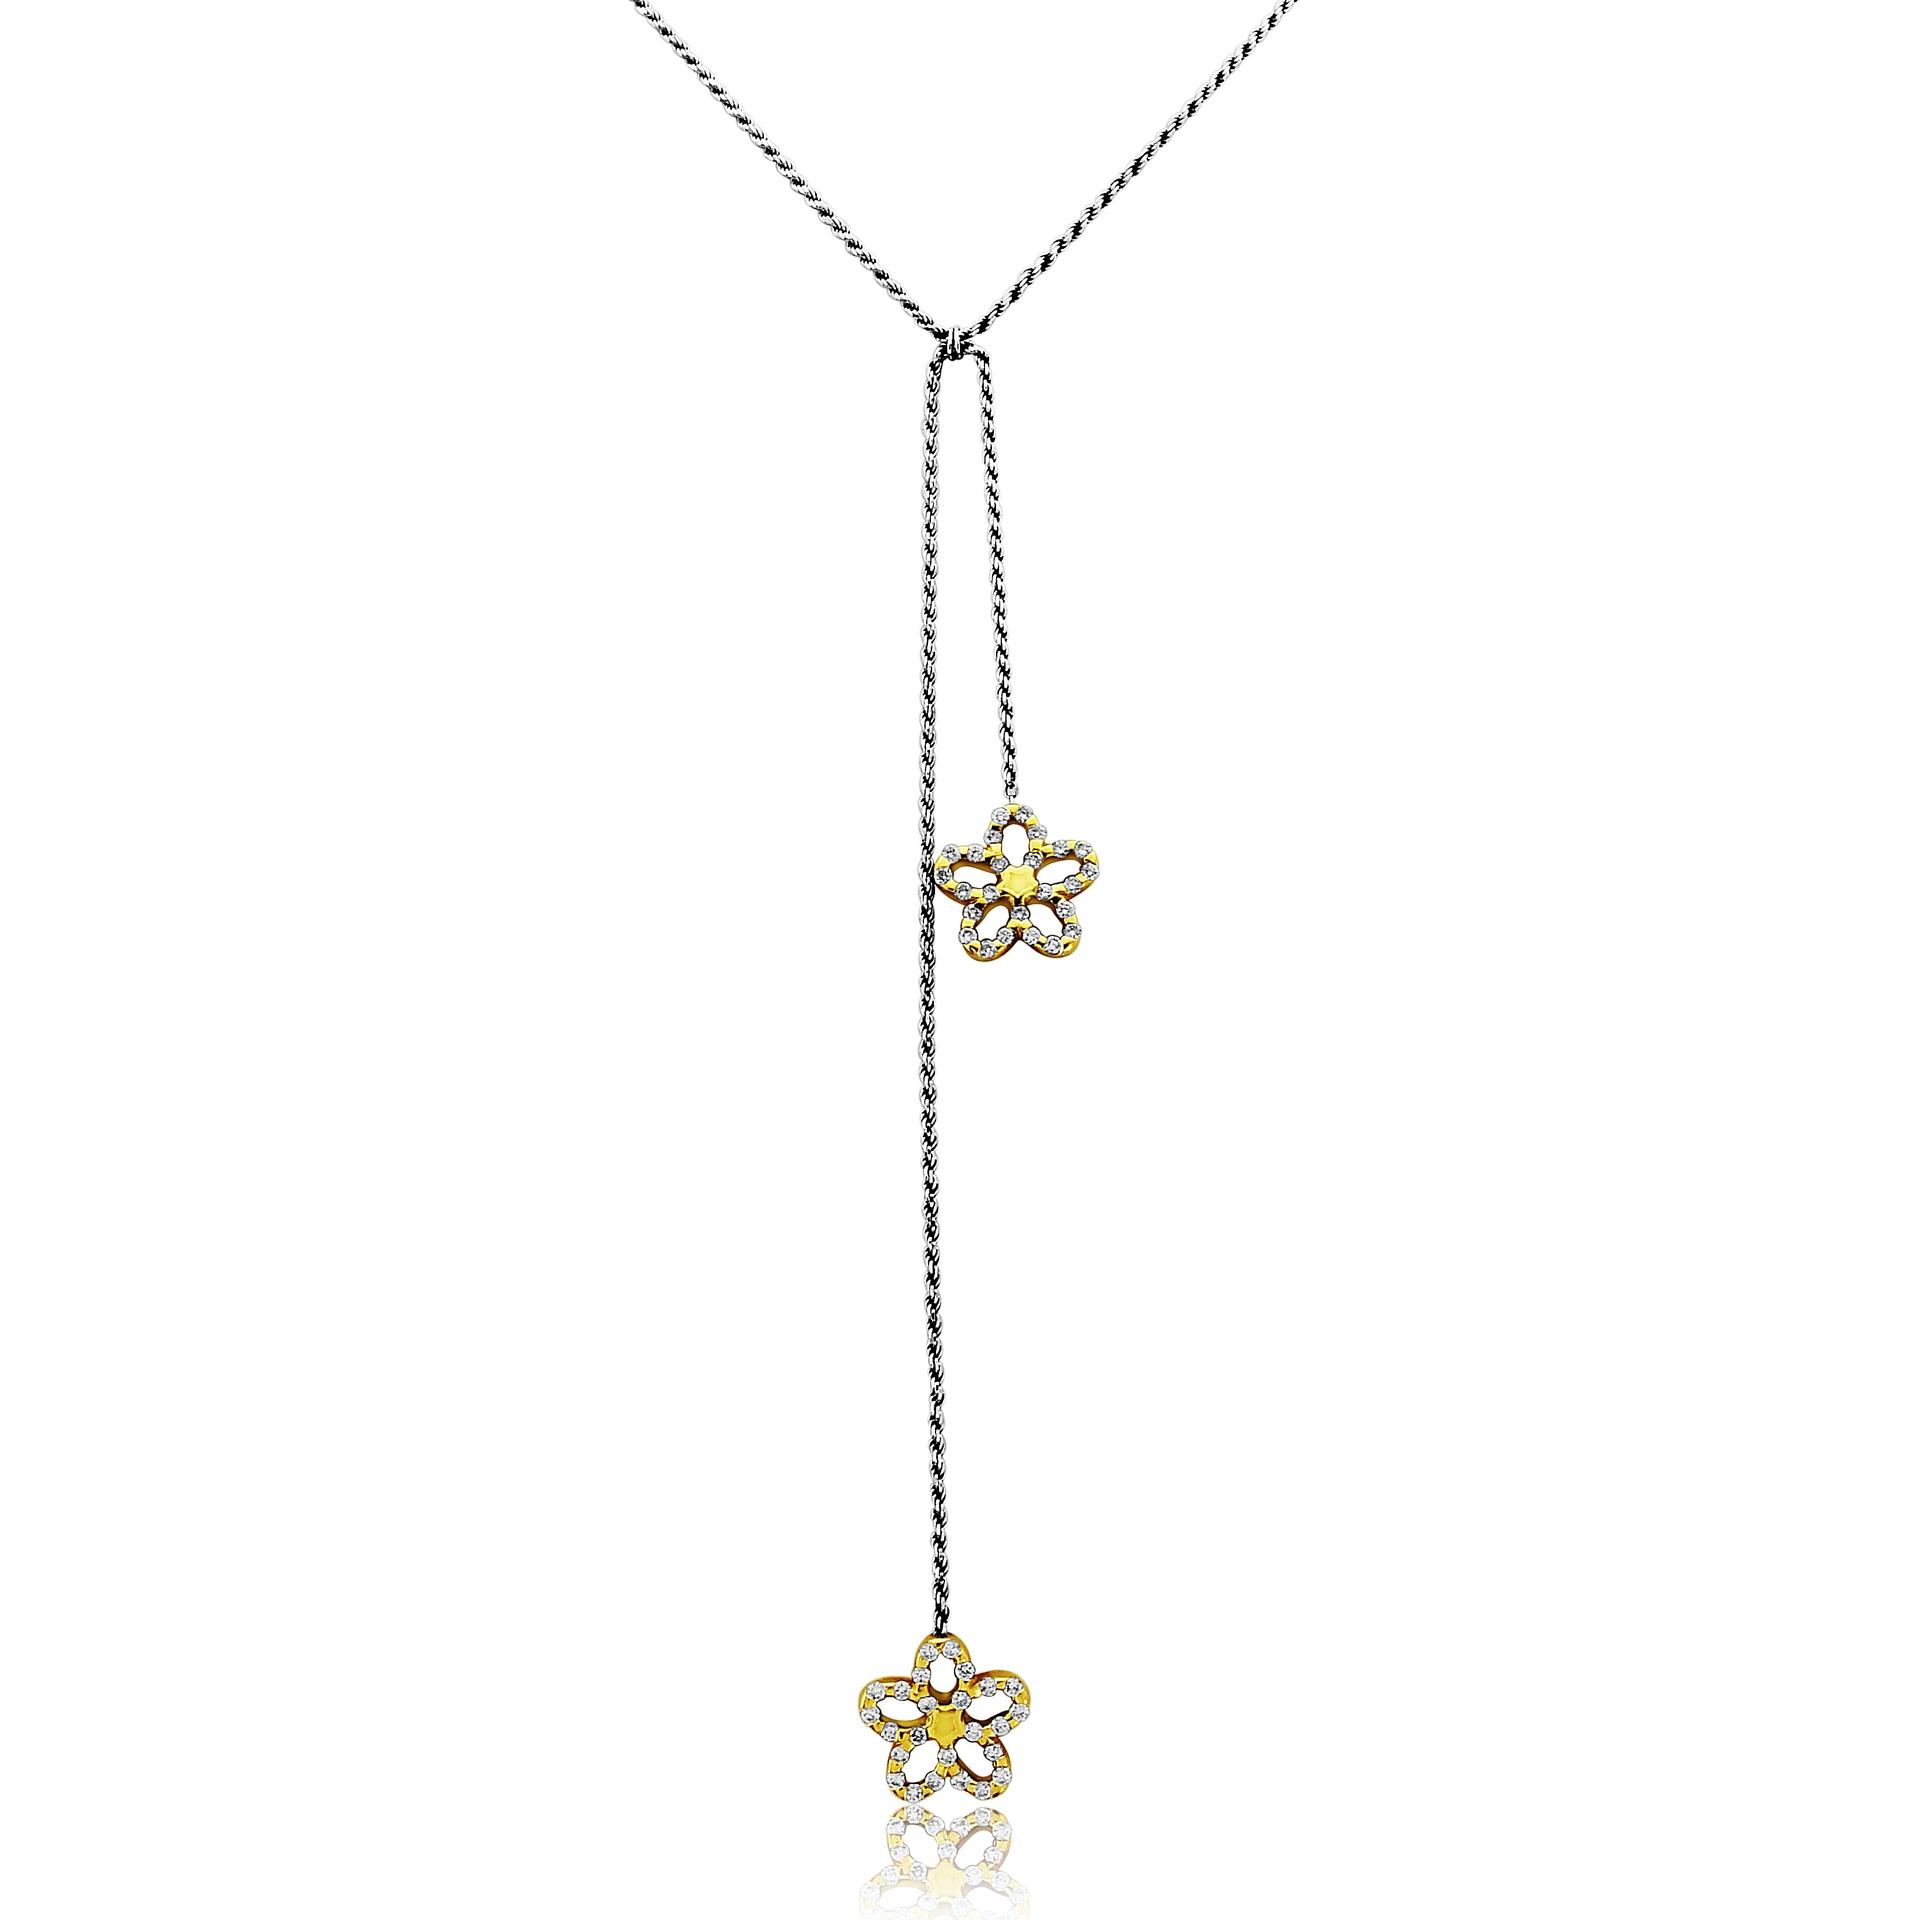 18ct White Gold Flower Necklet